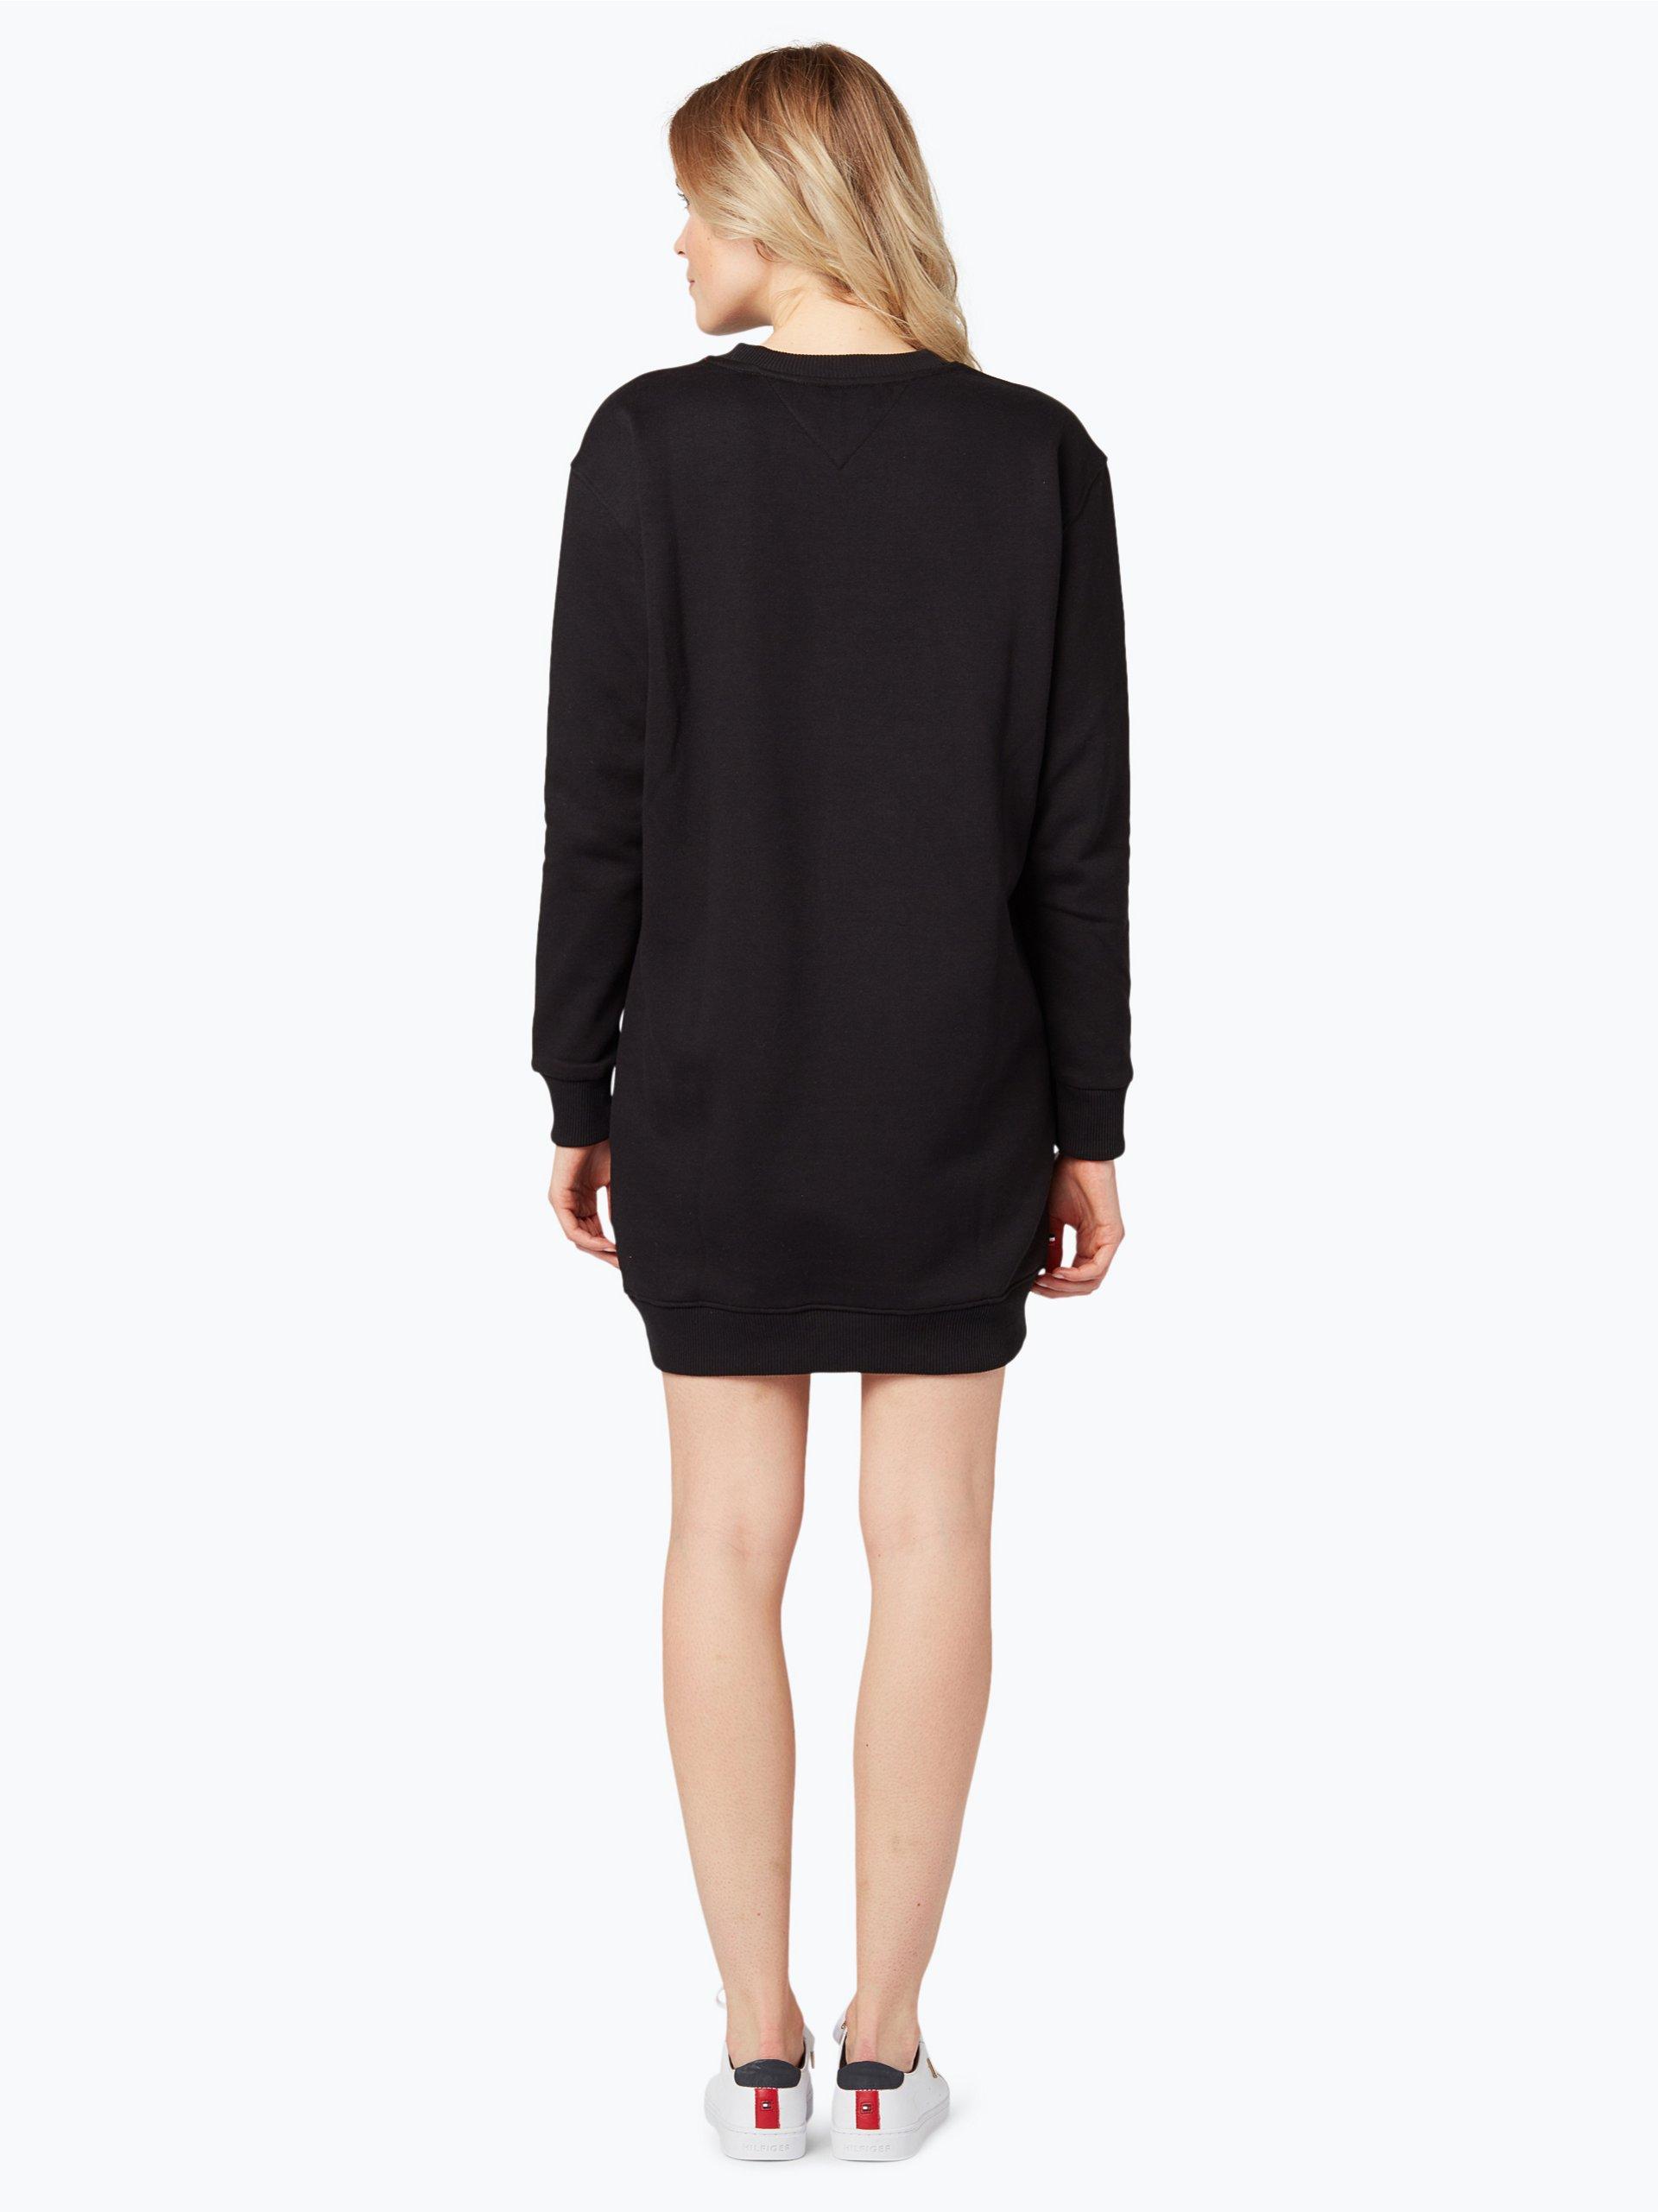 tommy jeans damen kleid schwarz uni online kaufen peek. Black Bedroom Furniture Sets. Home Design Ideas